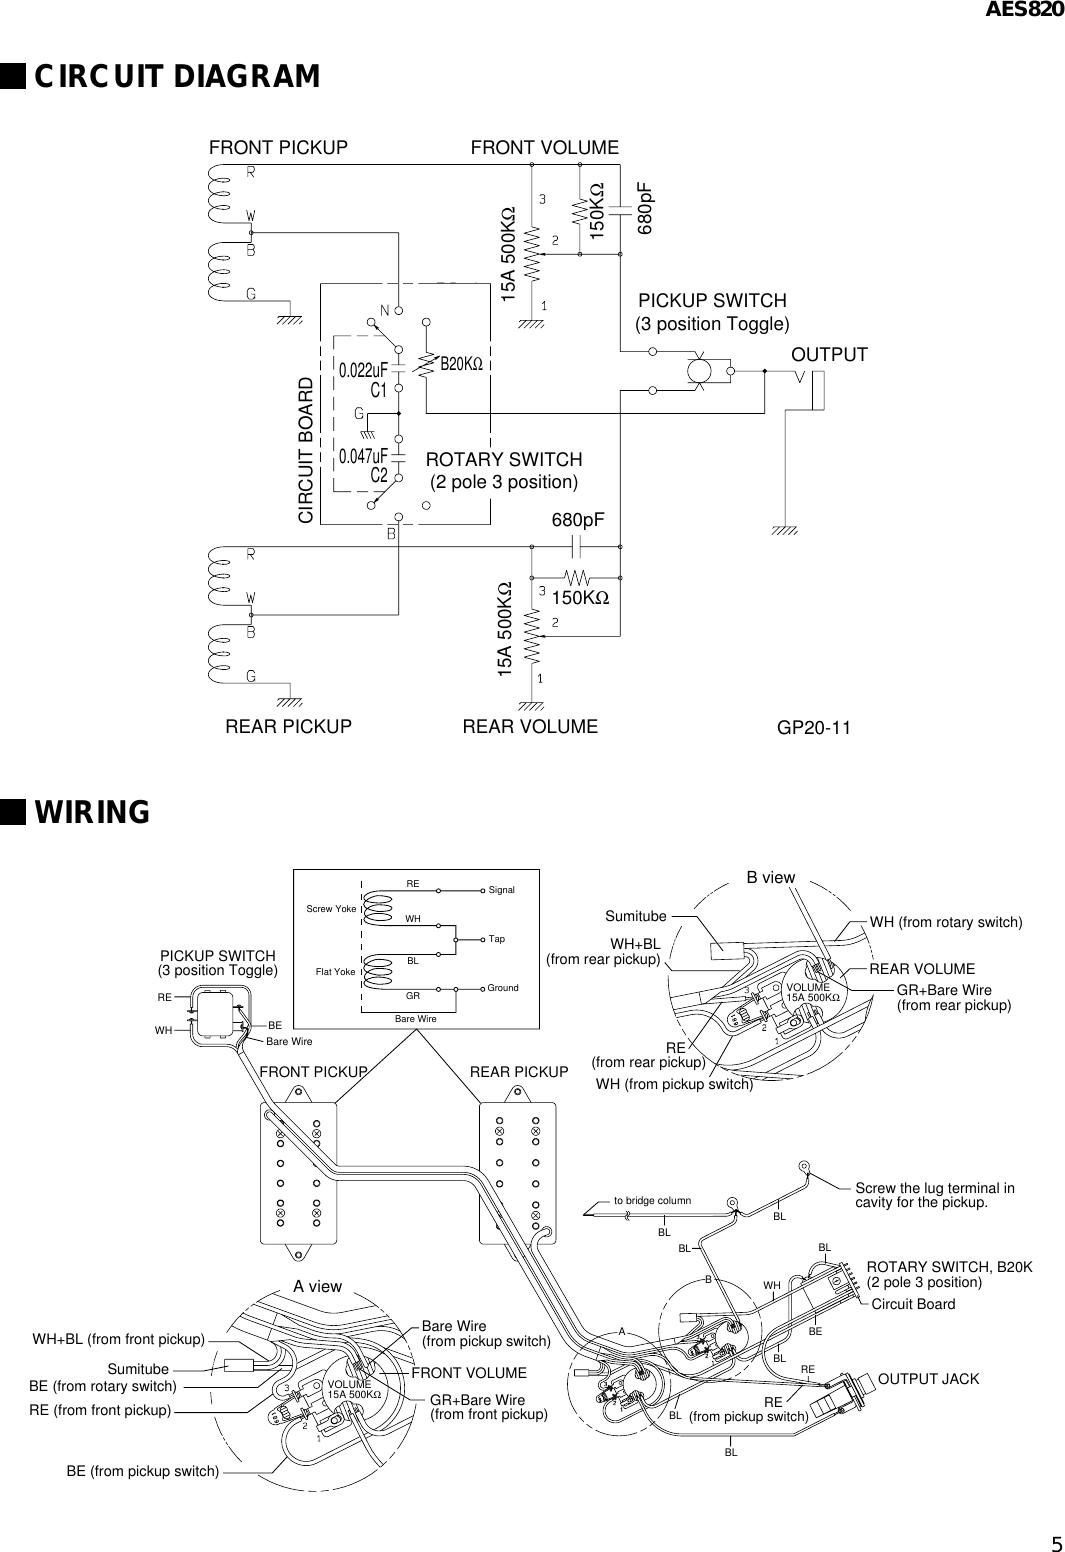 Yamaha Guitar Aes820 Users Manual Humbucker Pickup Wiring Page 5 Of 6